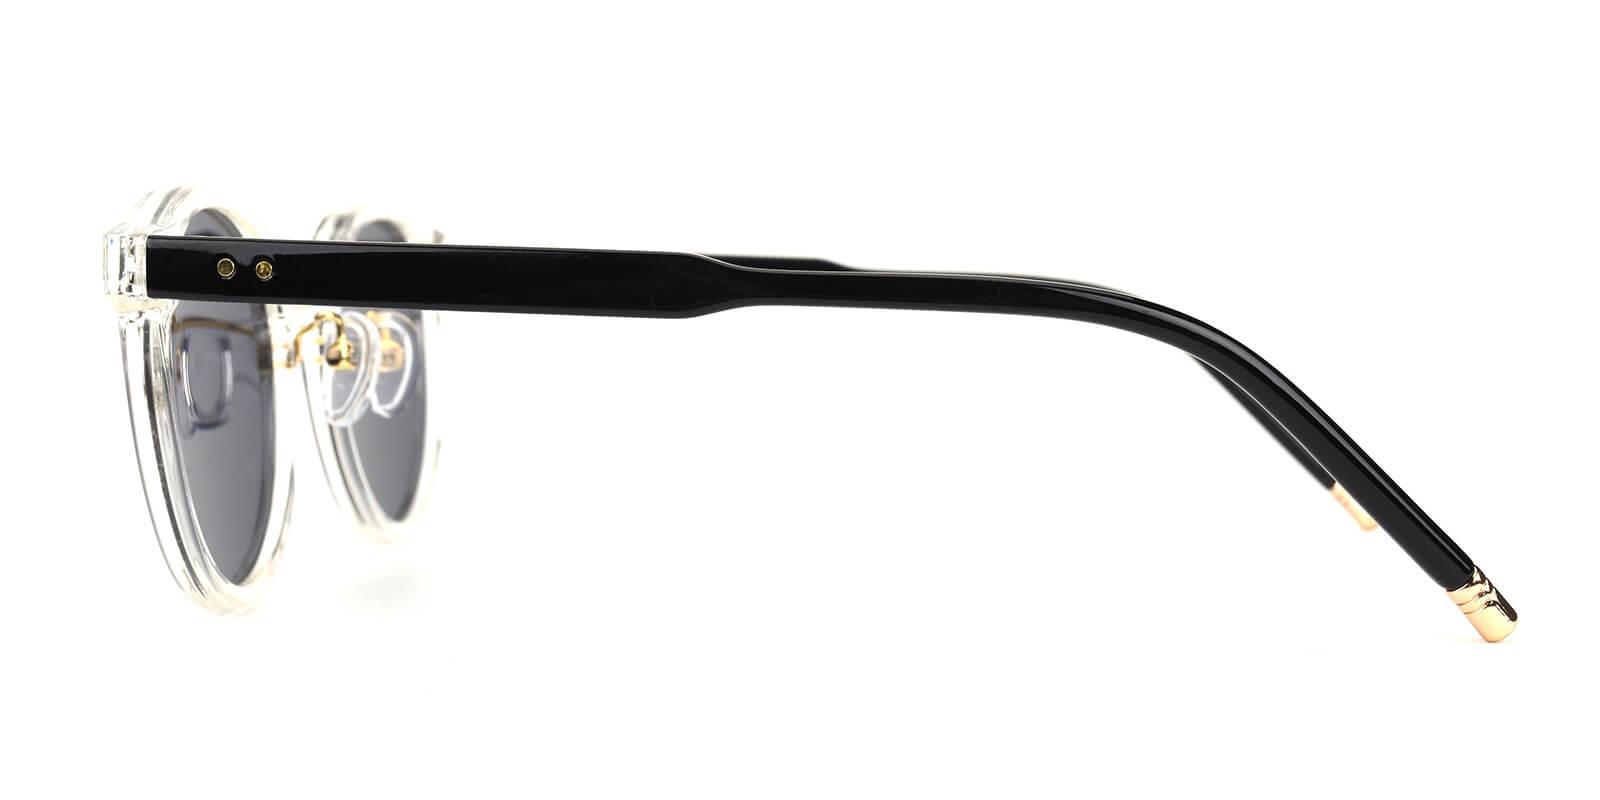 Chiny-Translucent-Round / Cat-TR-Sunglasses-detail